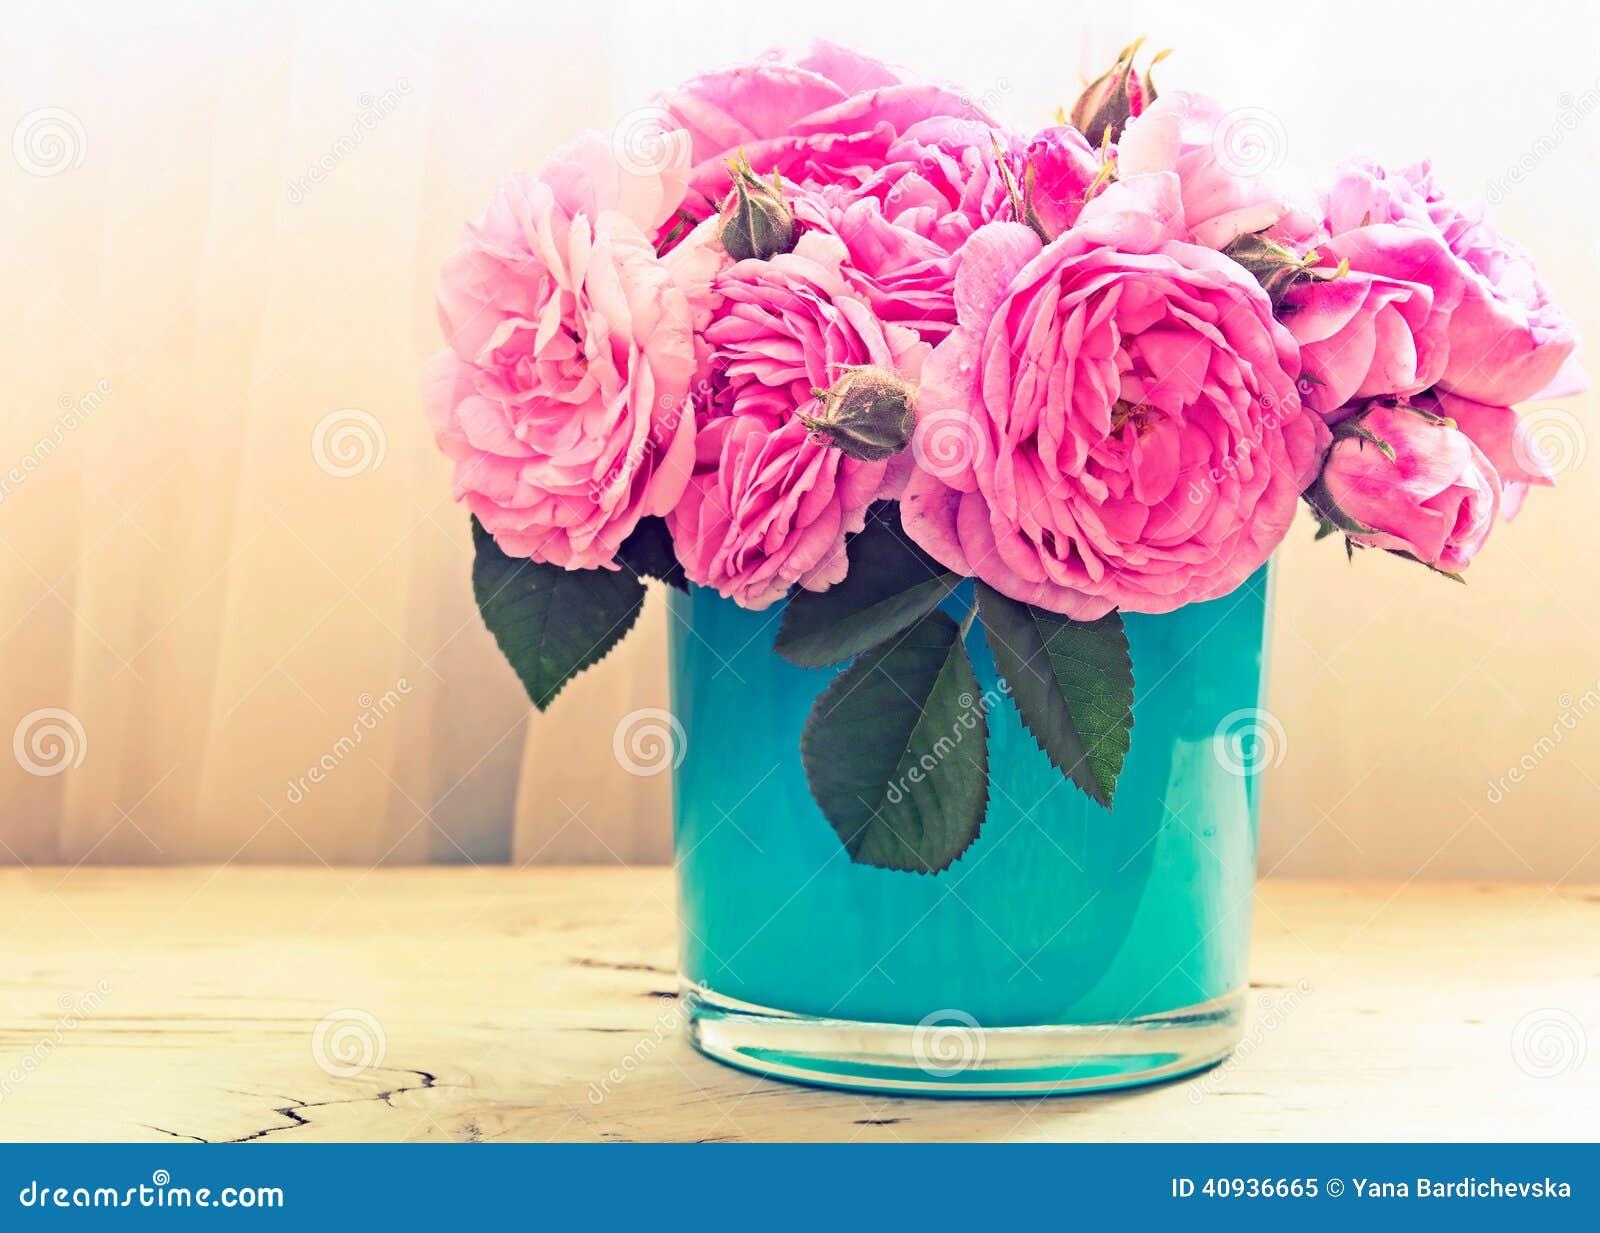 Pink roses in vase flowers indoor stock image image of retro pink roses in vase flowers indoor mightylinksfo